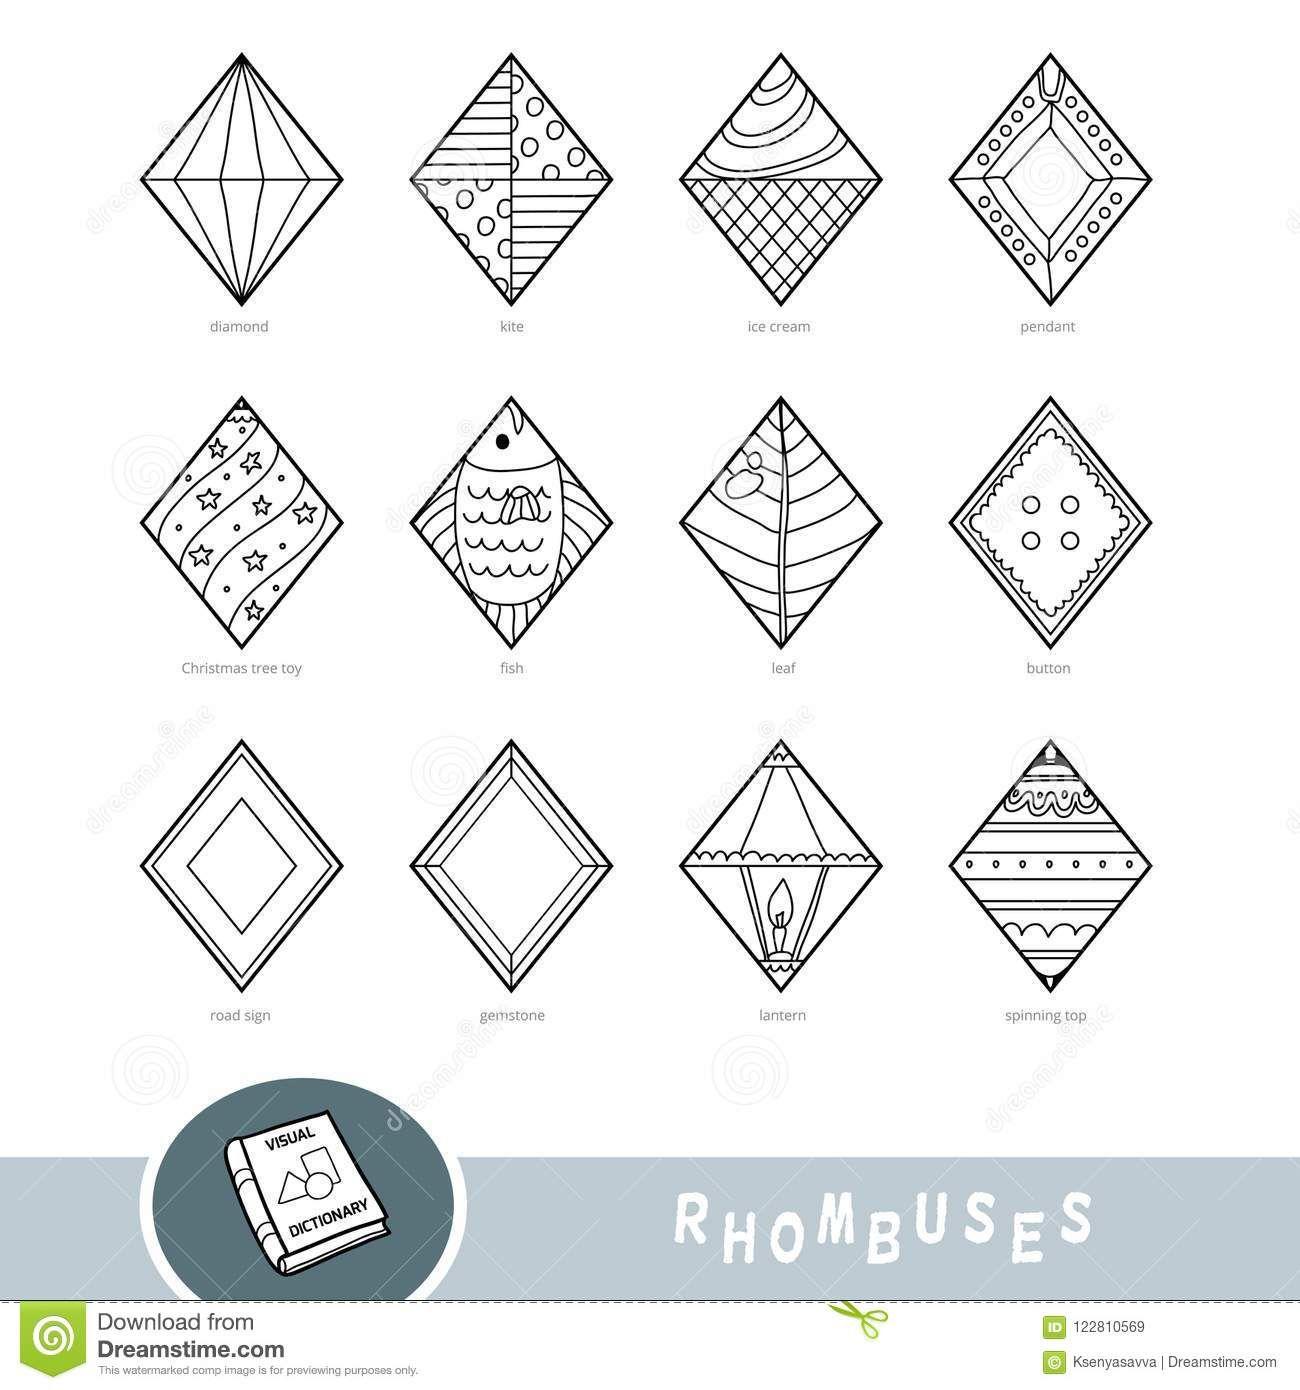 Illustration About Black And White Set Of Rhombus Shape